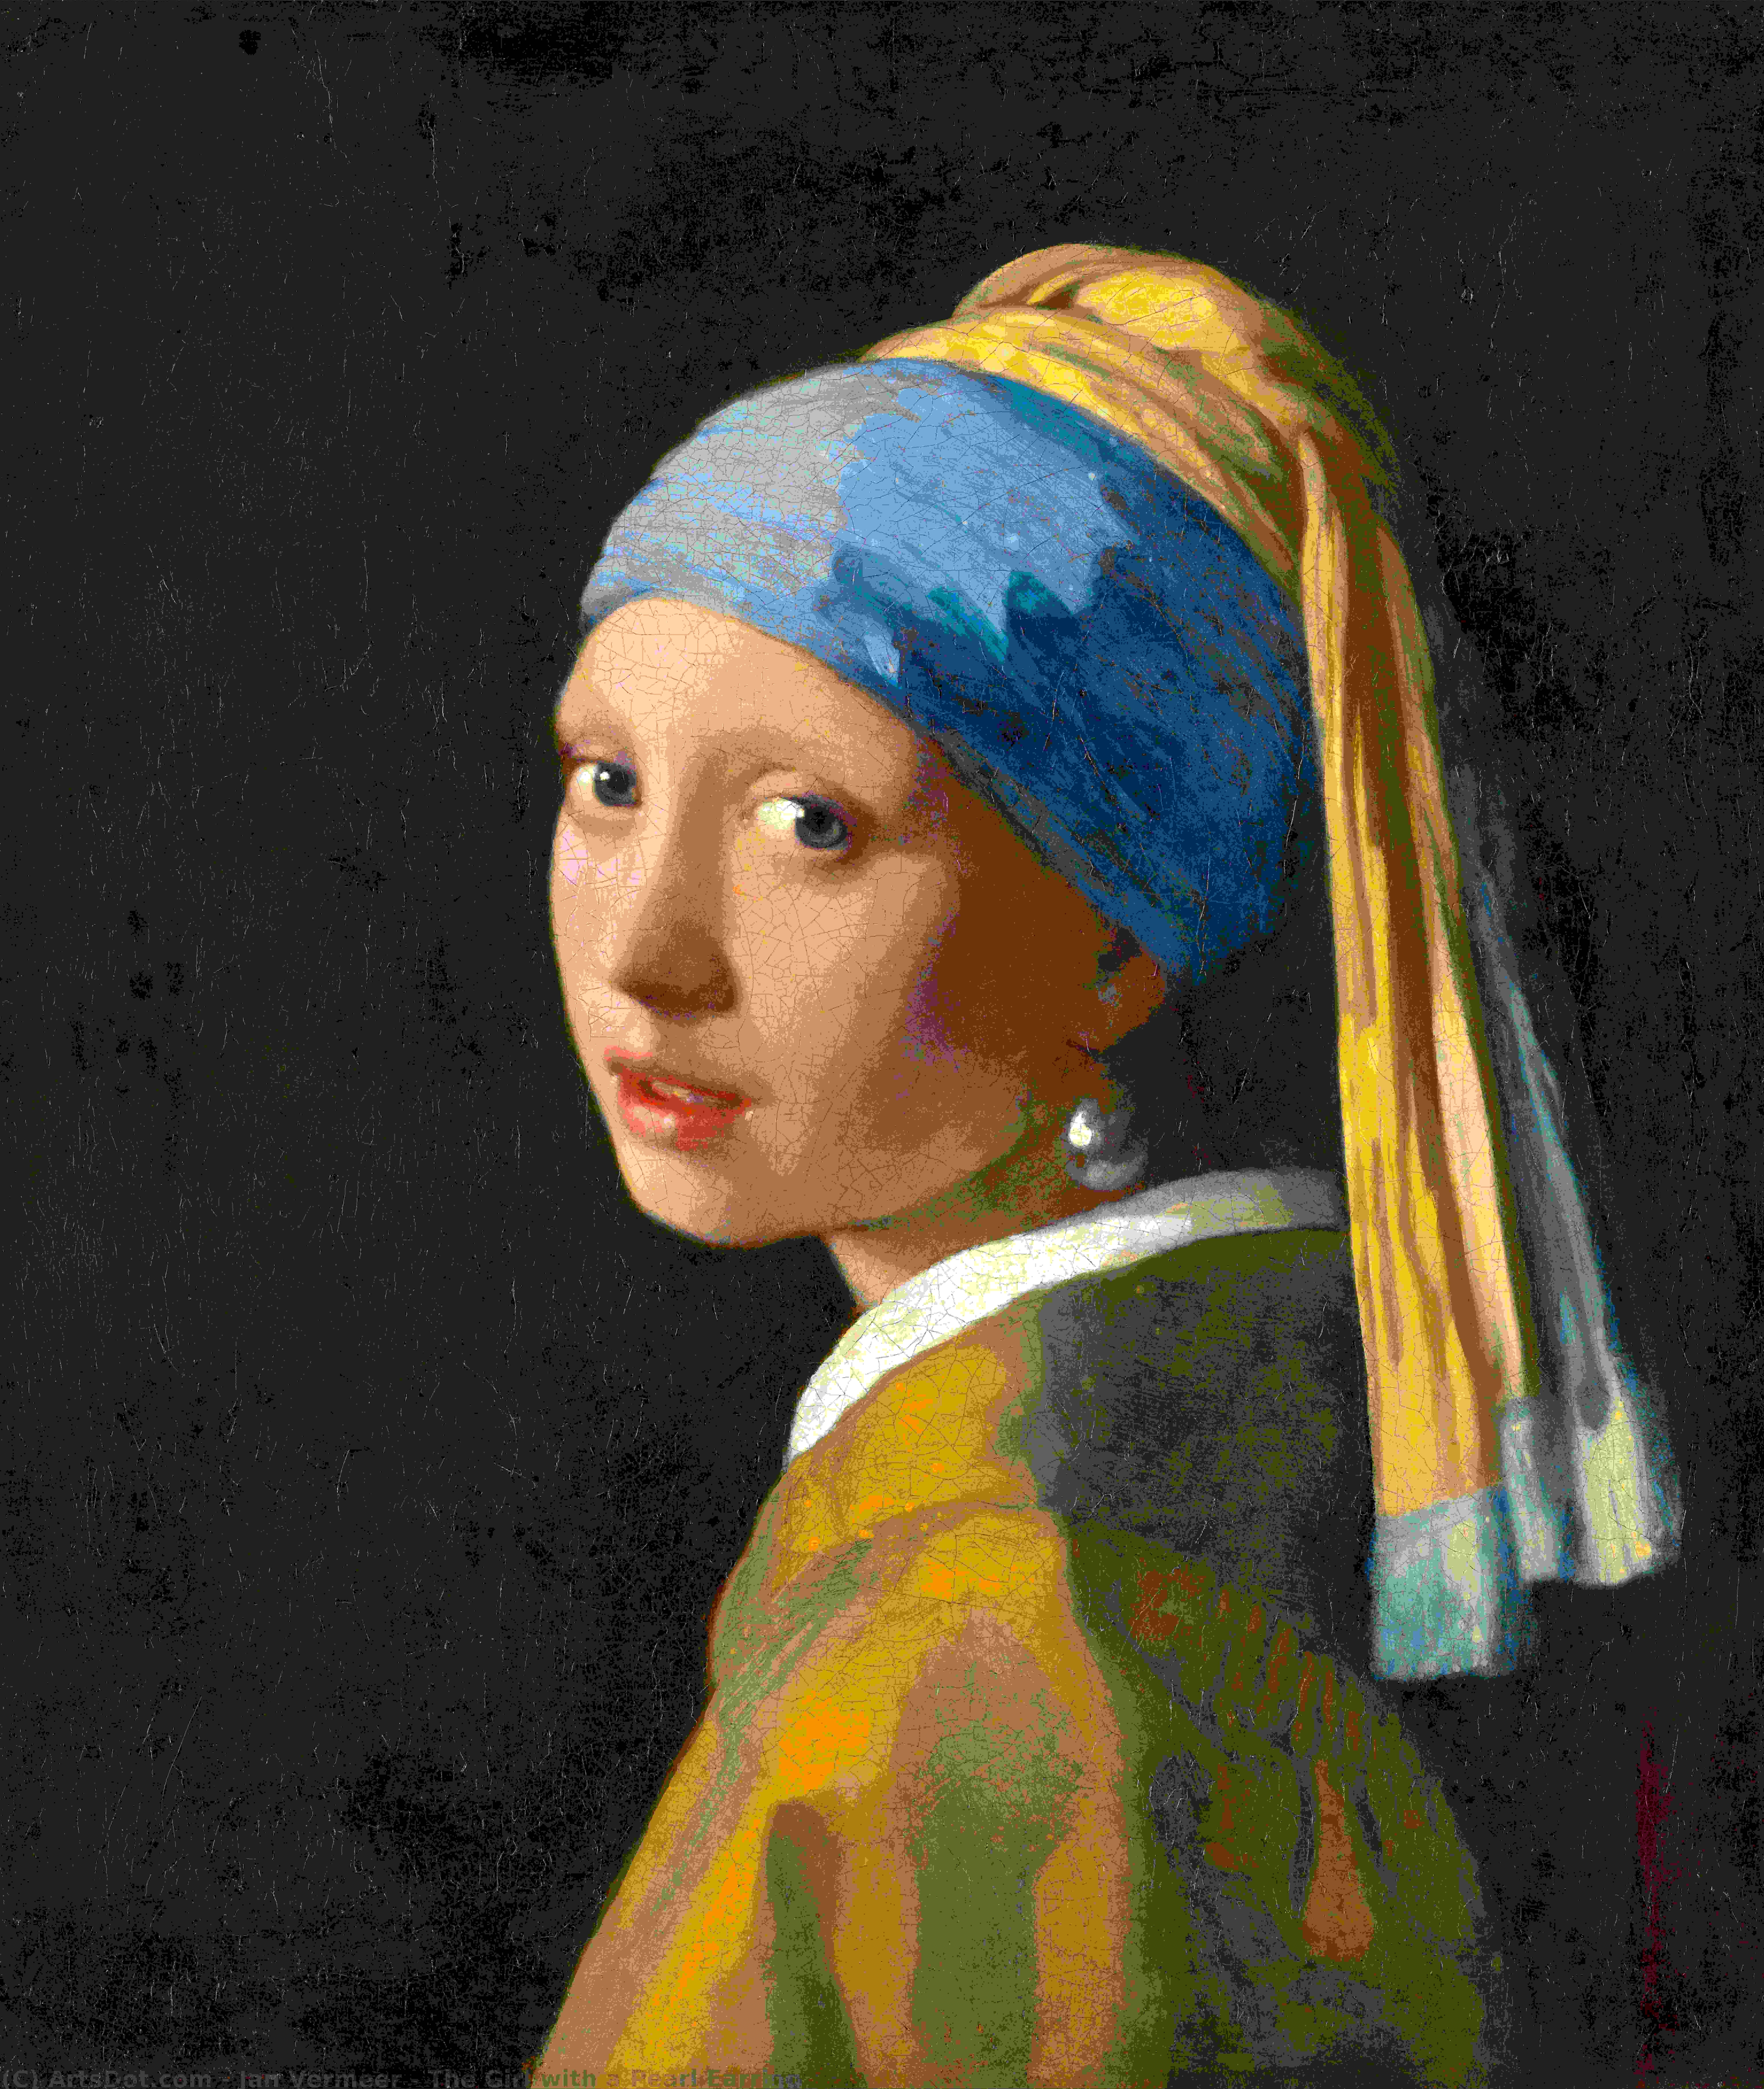 Wikoo.org - موسوعة الفنون الجميلة - اللوحة، العمل الفني Jan Vermeer - The Girl with a Pearl Earring